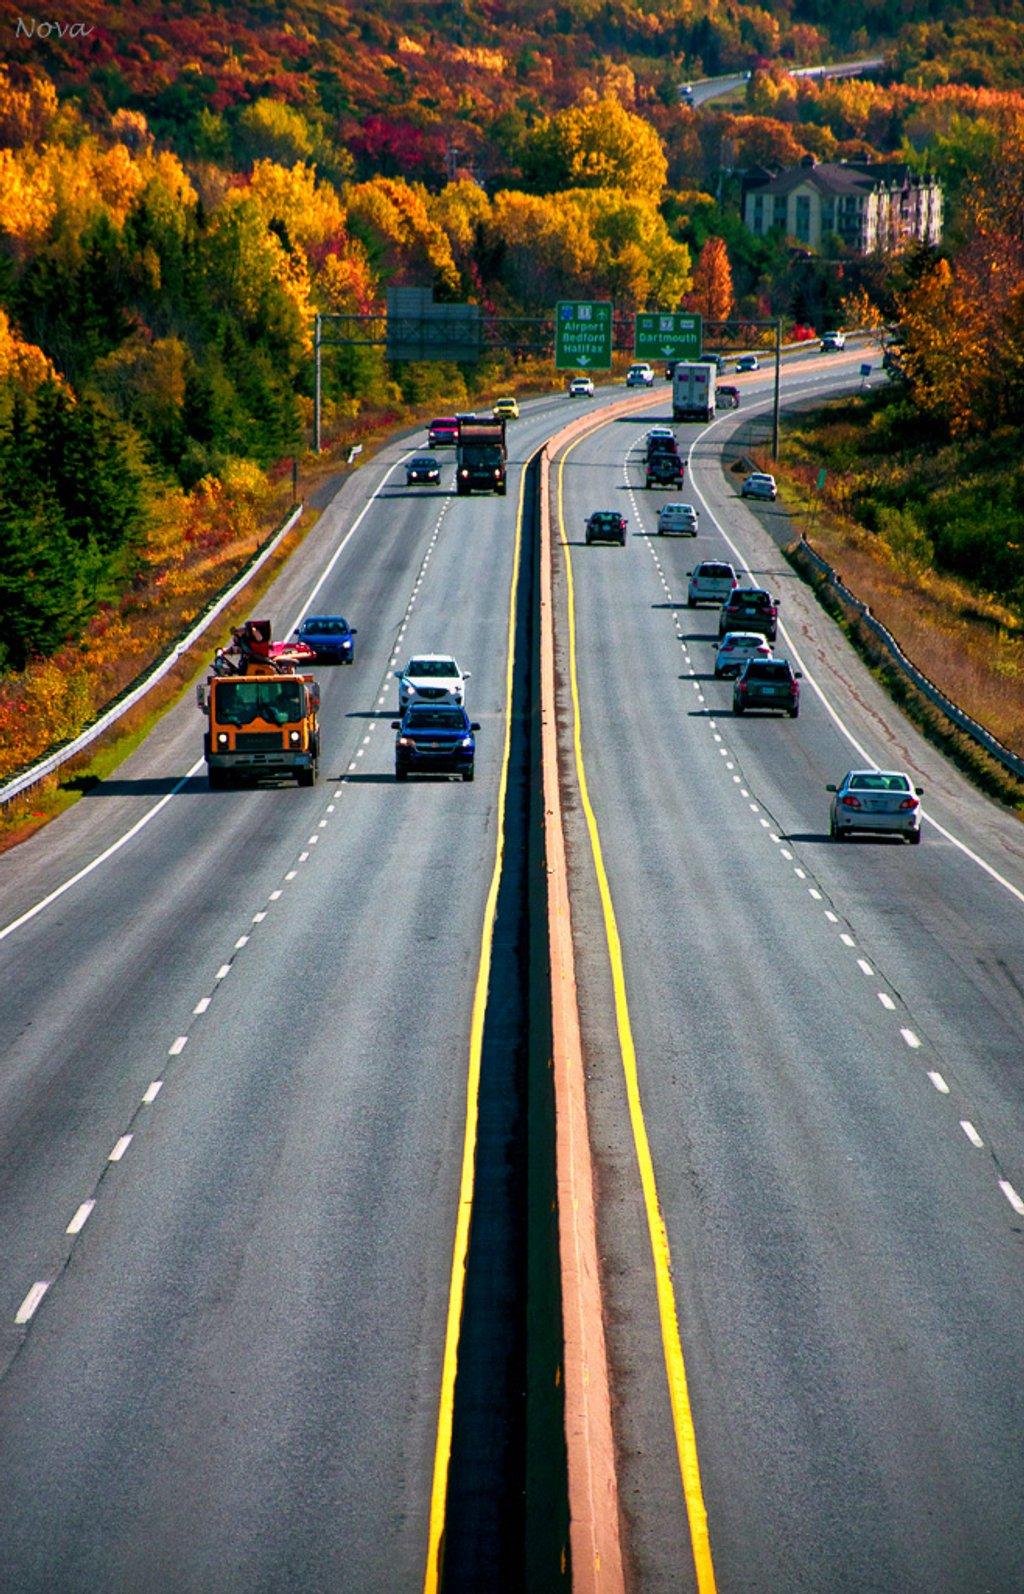 Highway 101 by novab